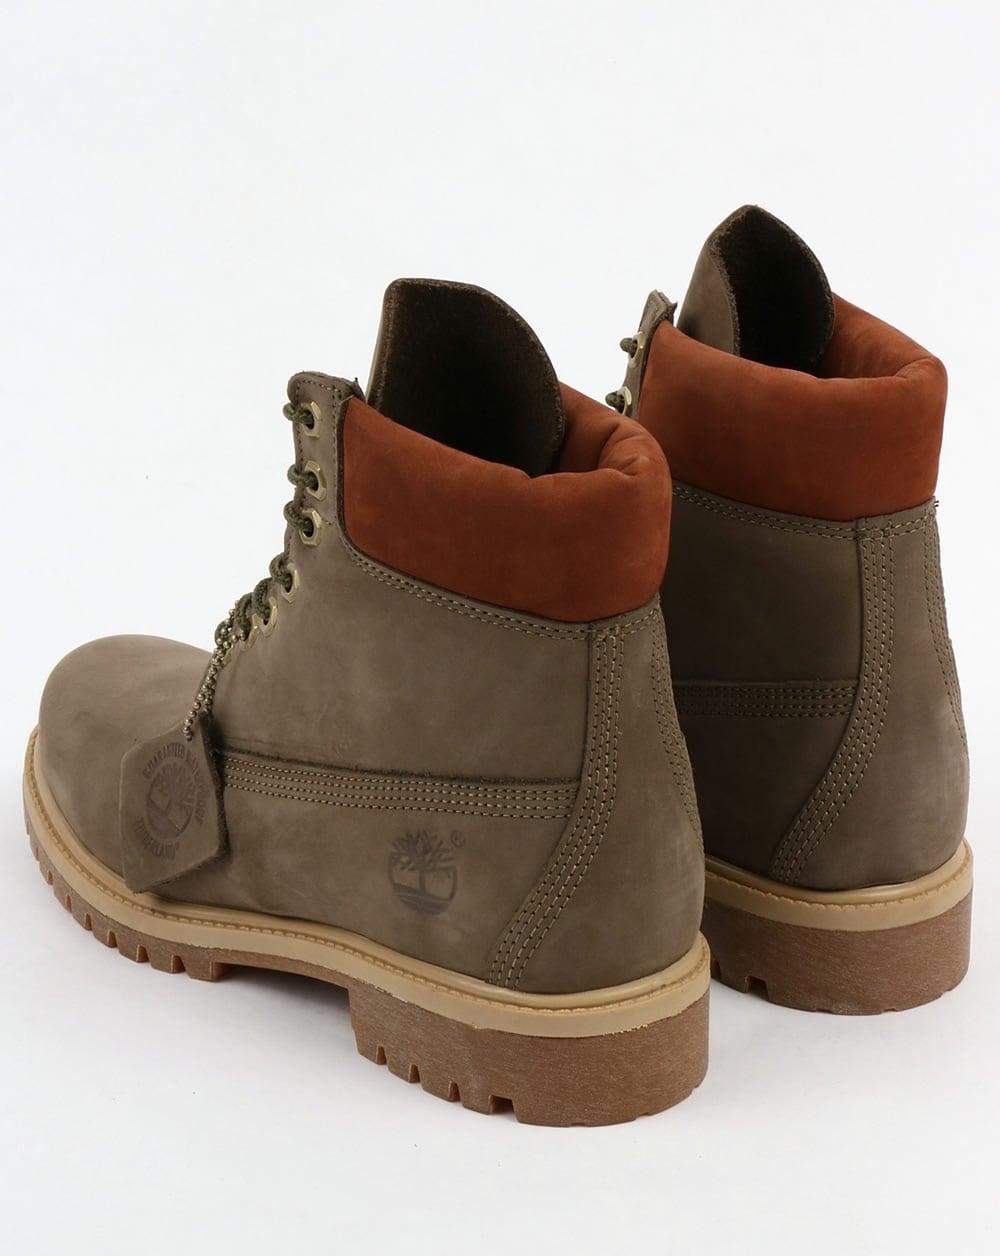 timberland 6 inch premium boots grey mens leather nubuck. Black Bedroom Furniture Sets. Home Design Ideas